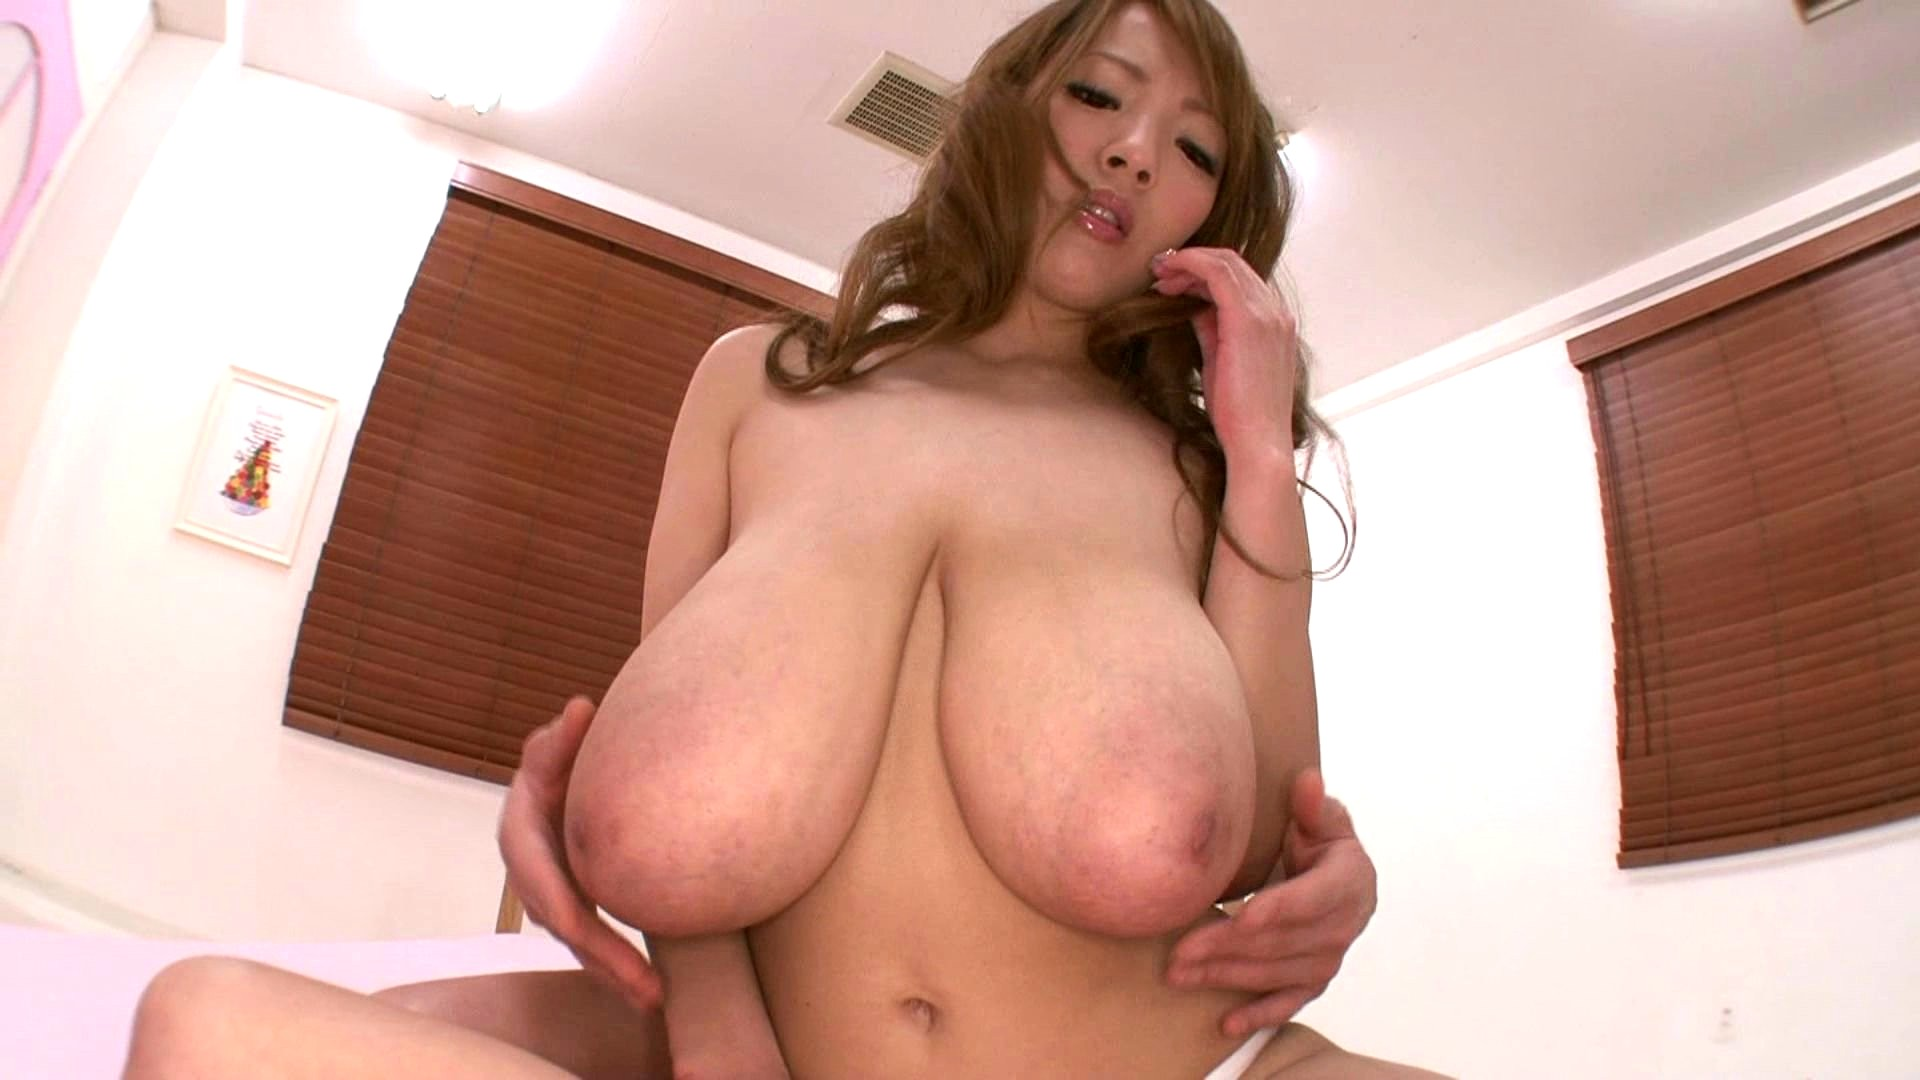 psp-porn-hitomi-tanaka-moroccan-female-nude-photos